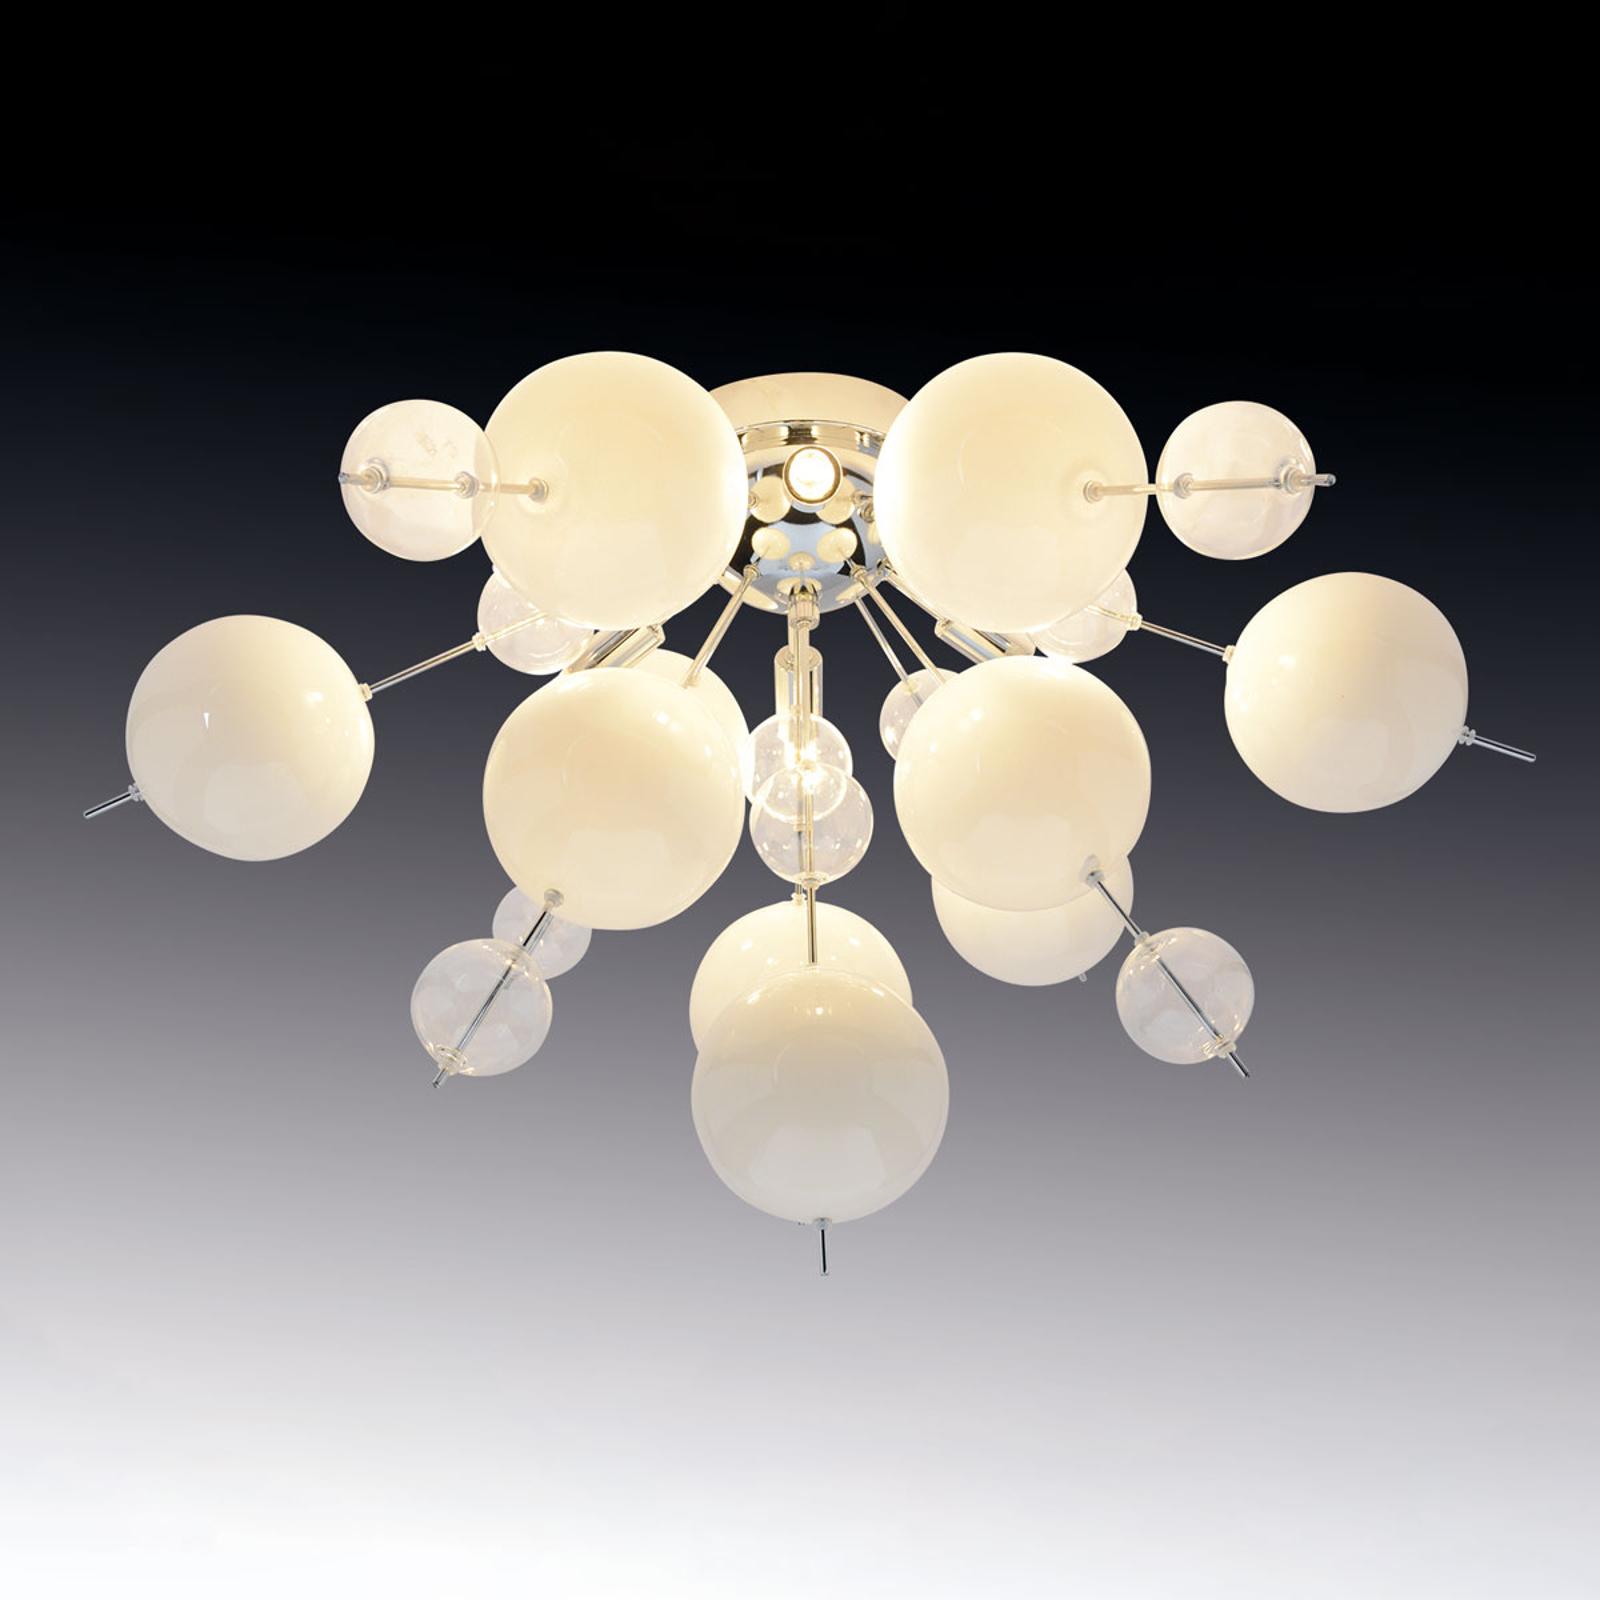 Lampa sufitowa Explosion, biel/chrom